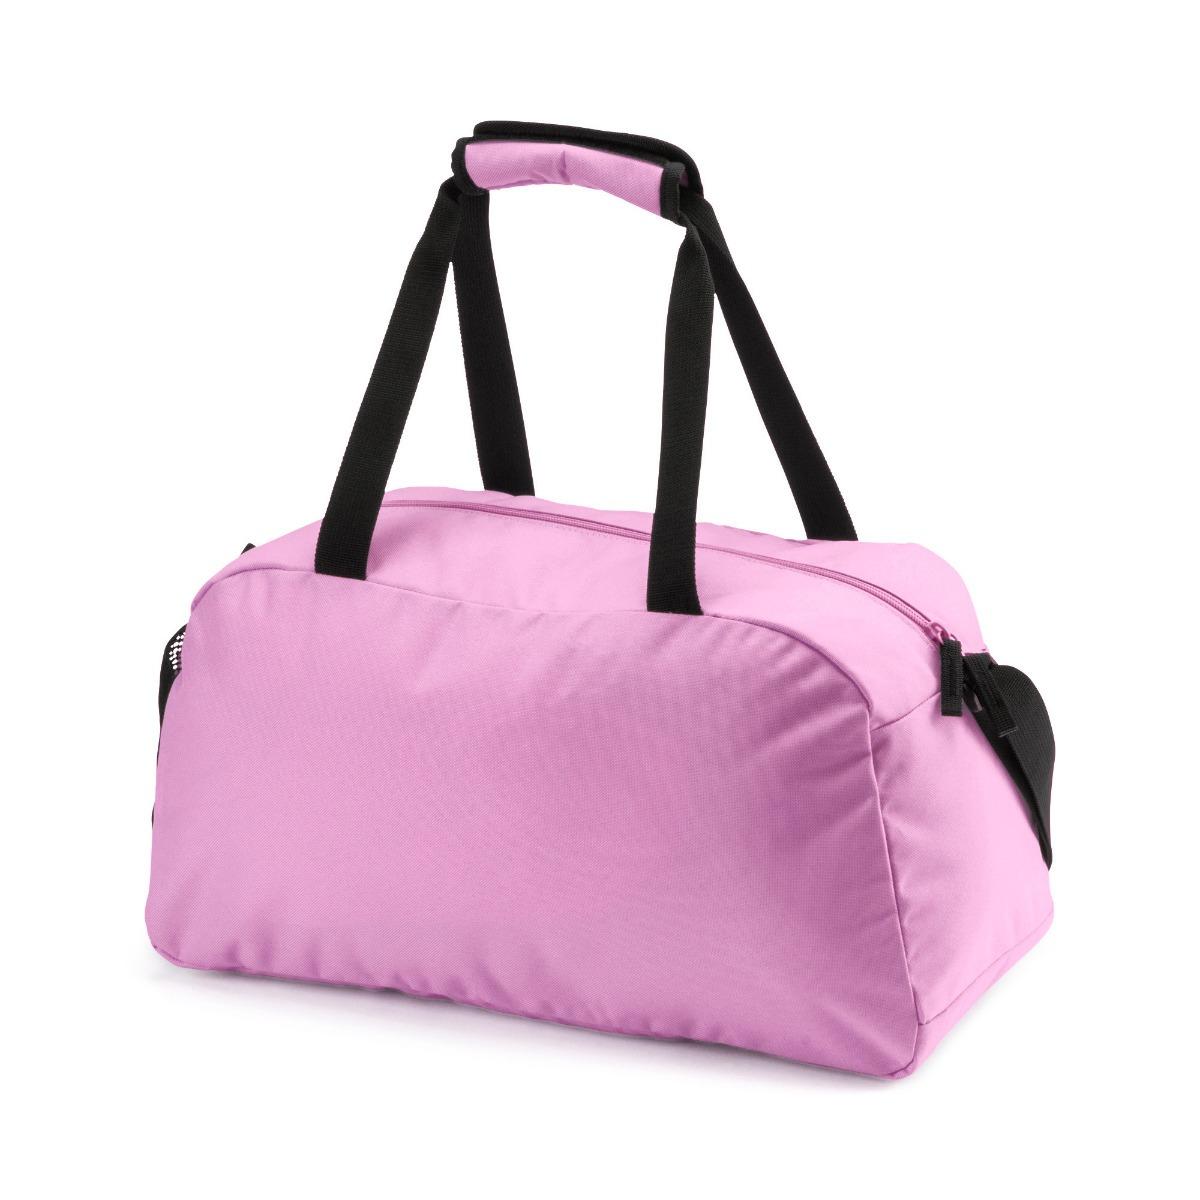 c7f32eacf bolso deportivo phase mujer rosa puma original importado. Cargando zoom.